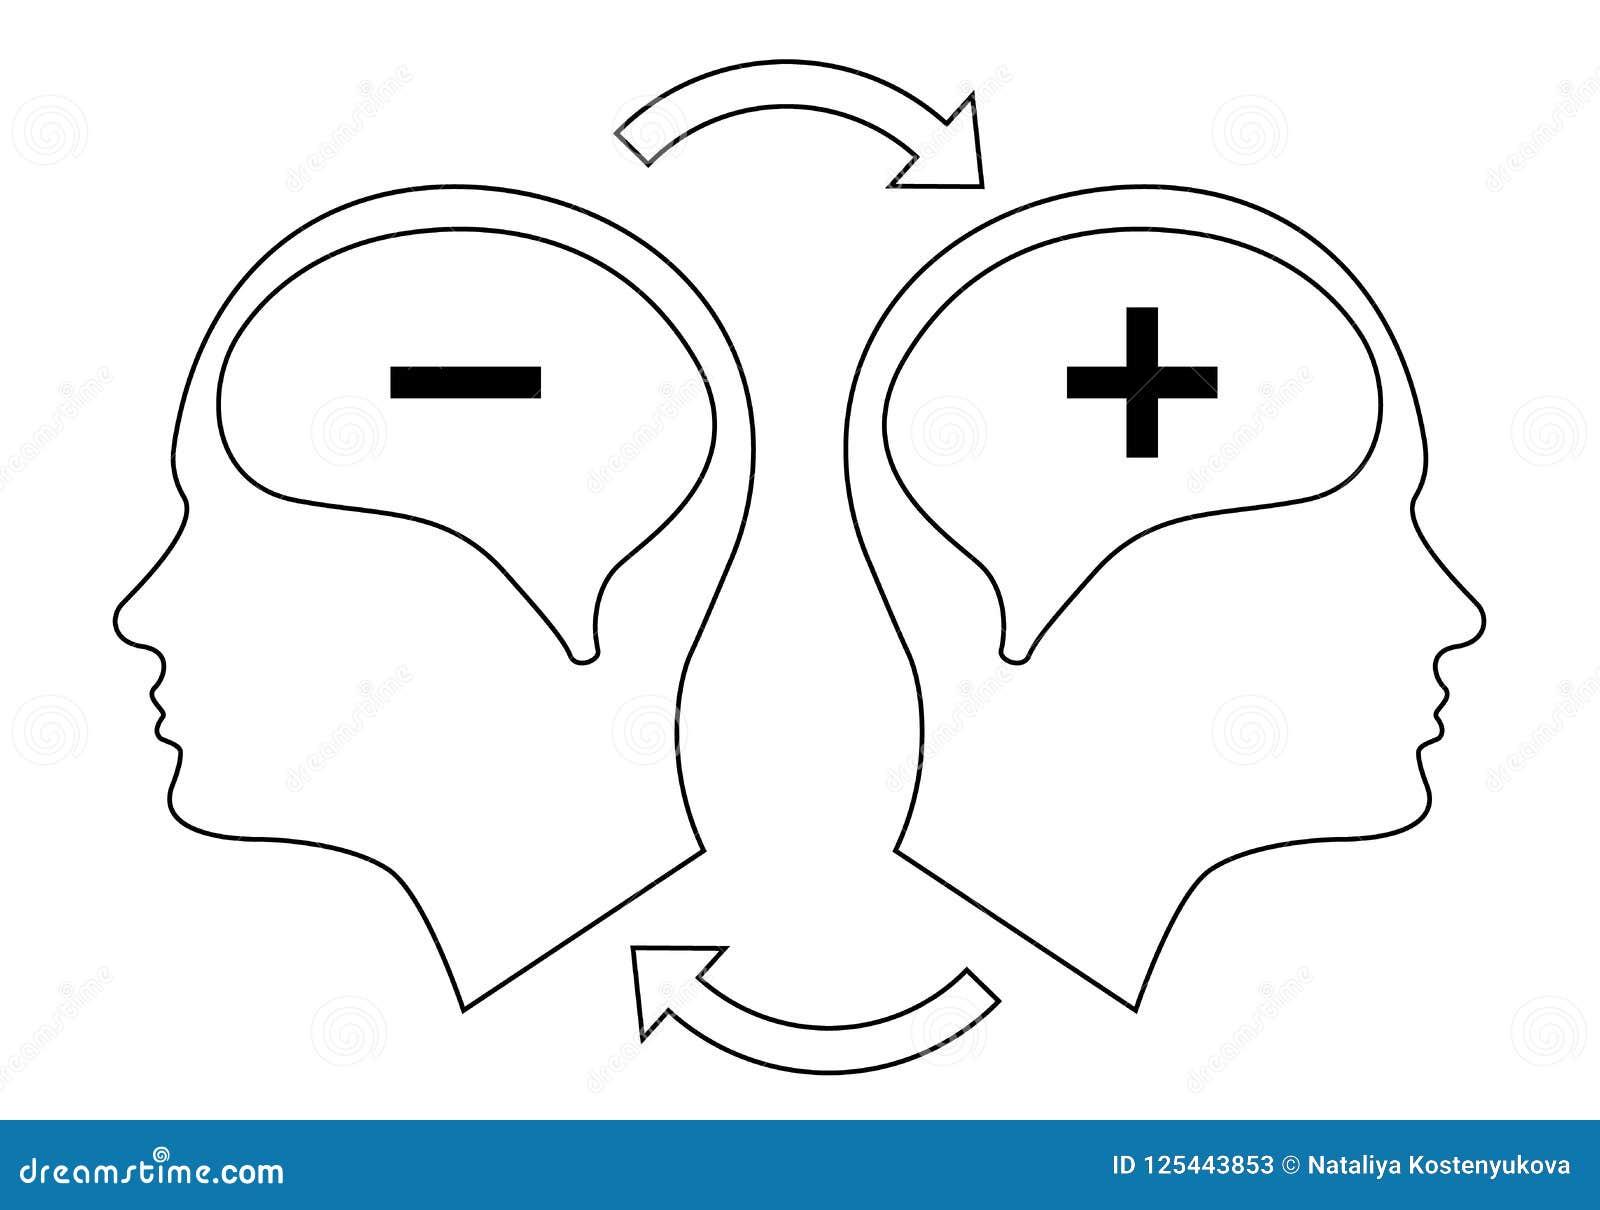 Head Icon For Bipolar Disorder Stock Vector Illustration Of Minus